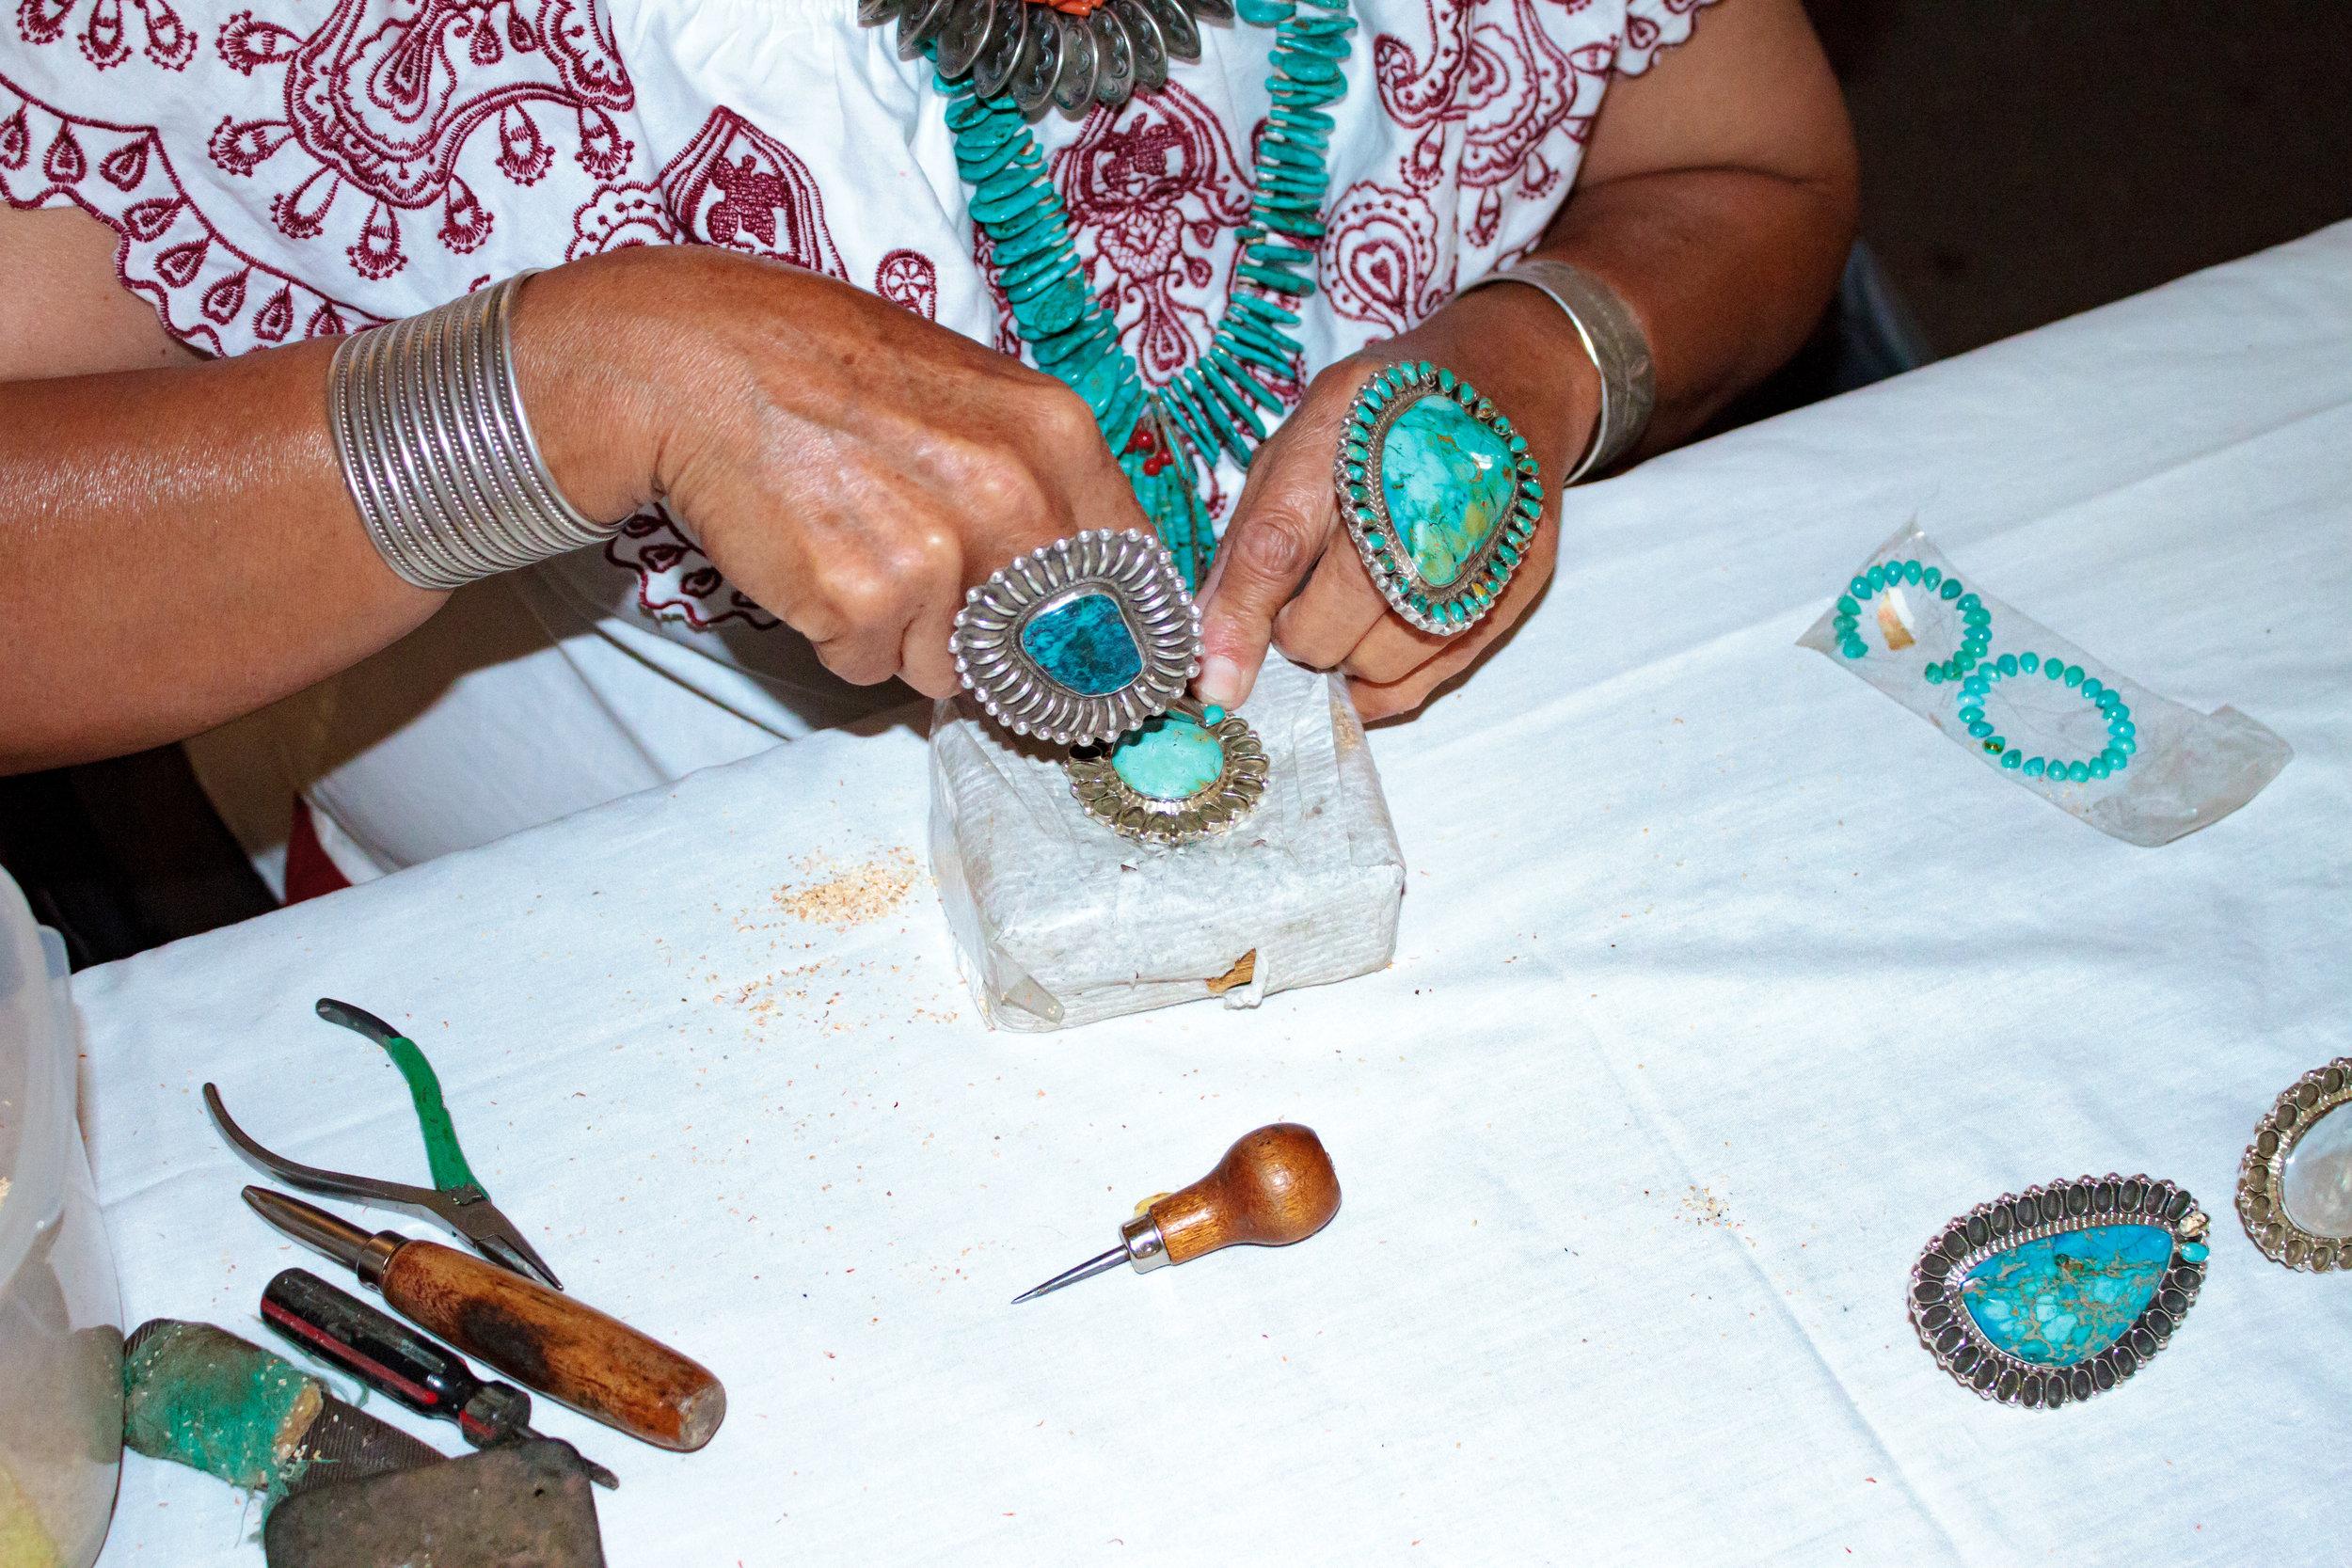 Demonstration by Navajo Jewelry Artisan Tonya June Rafael.